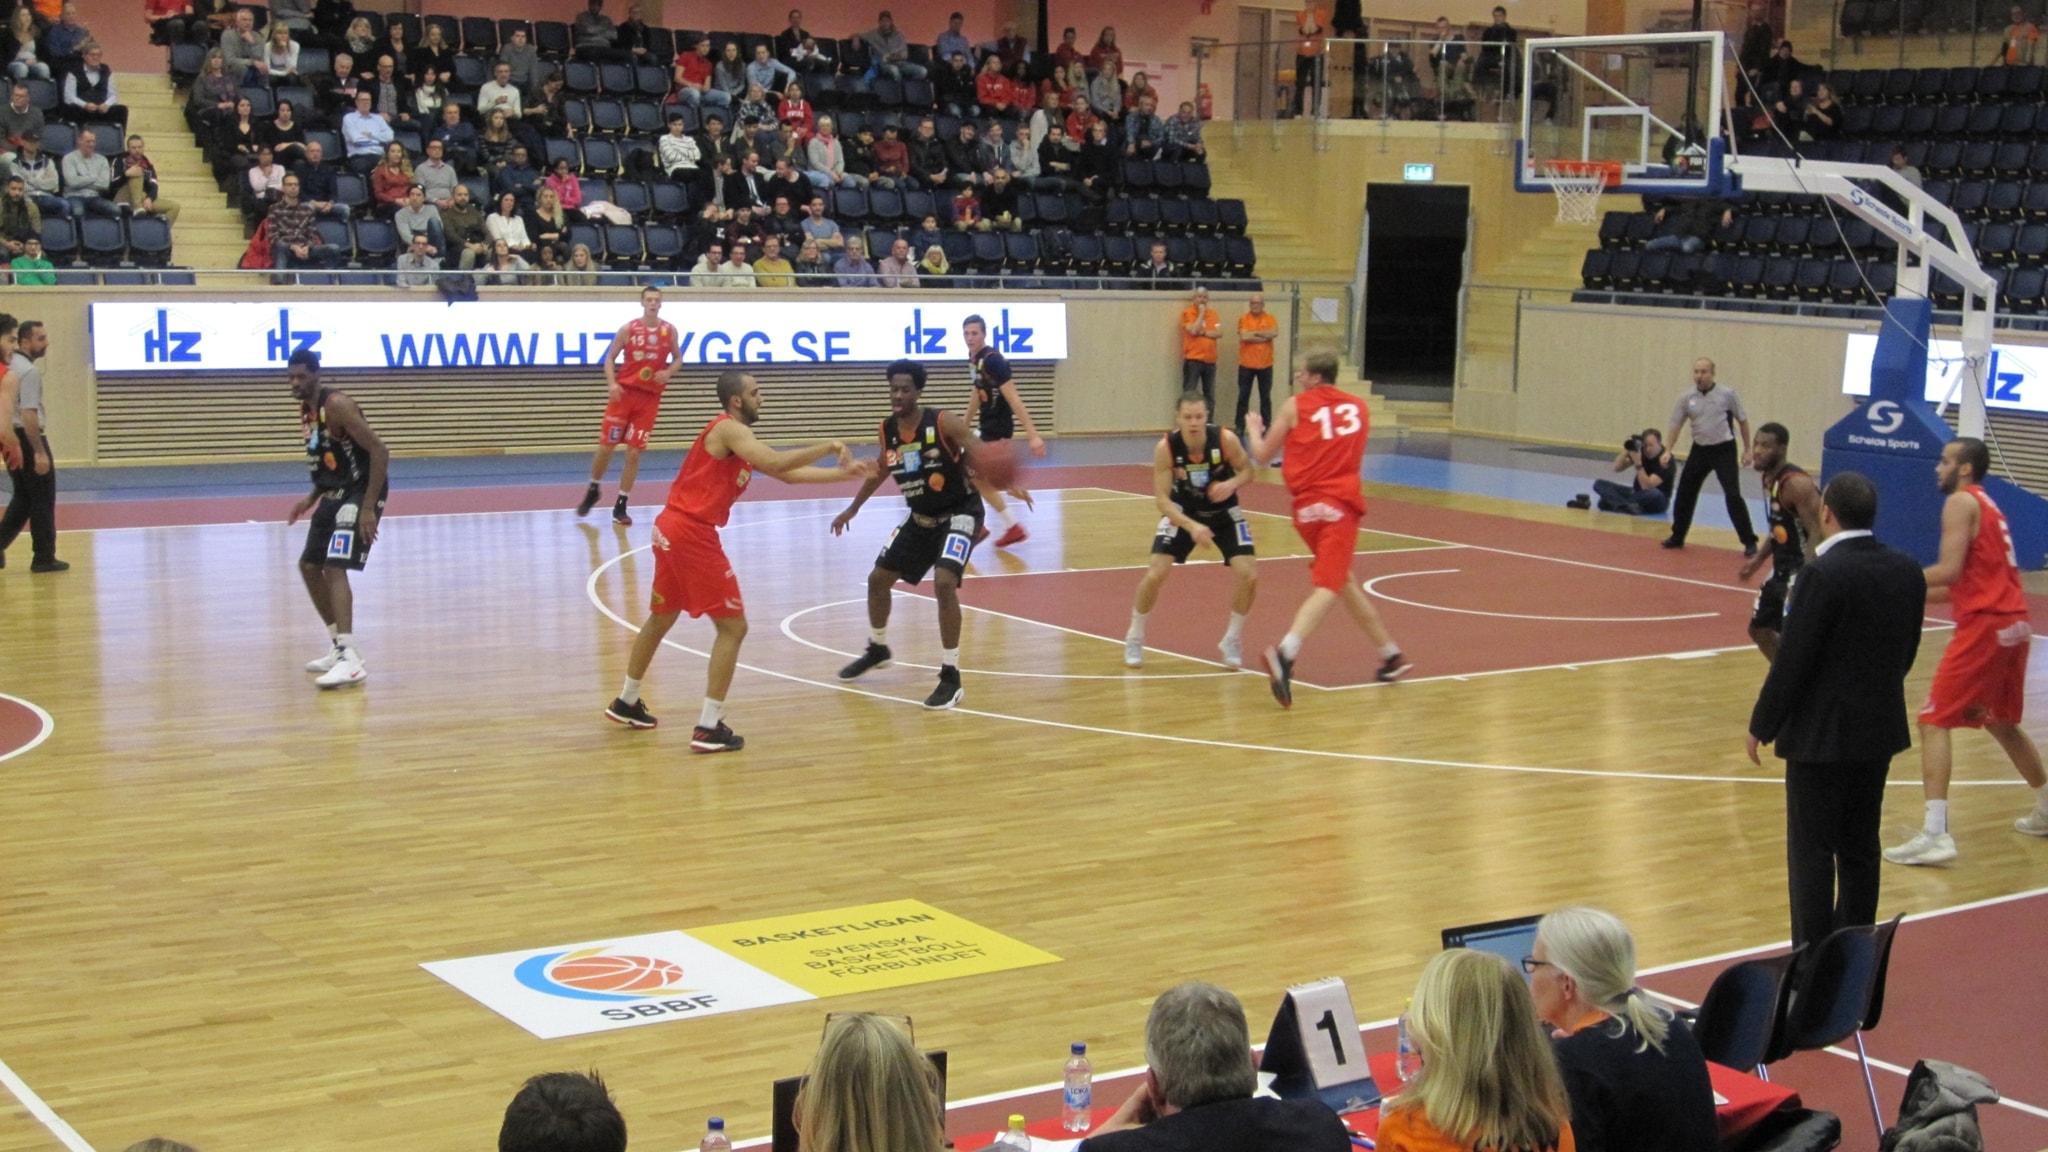 current team uppsala basket - HD2048×1152